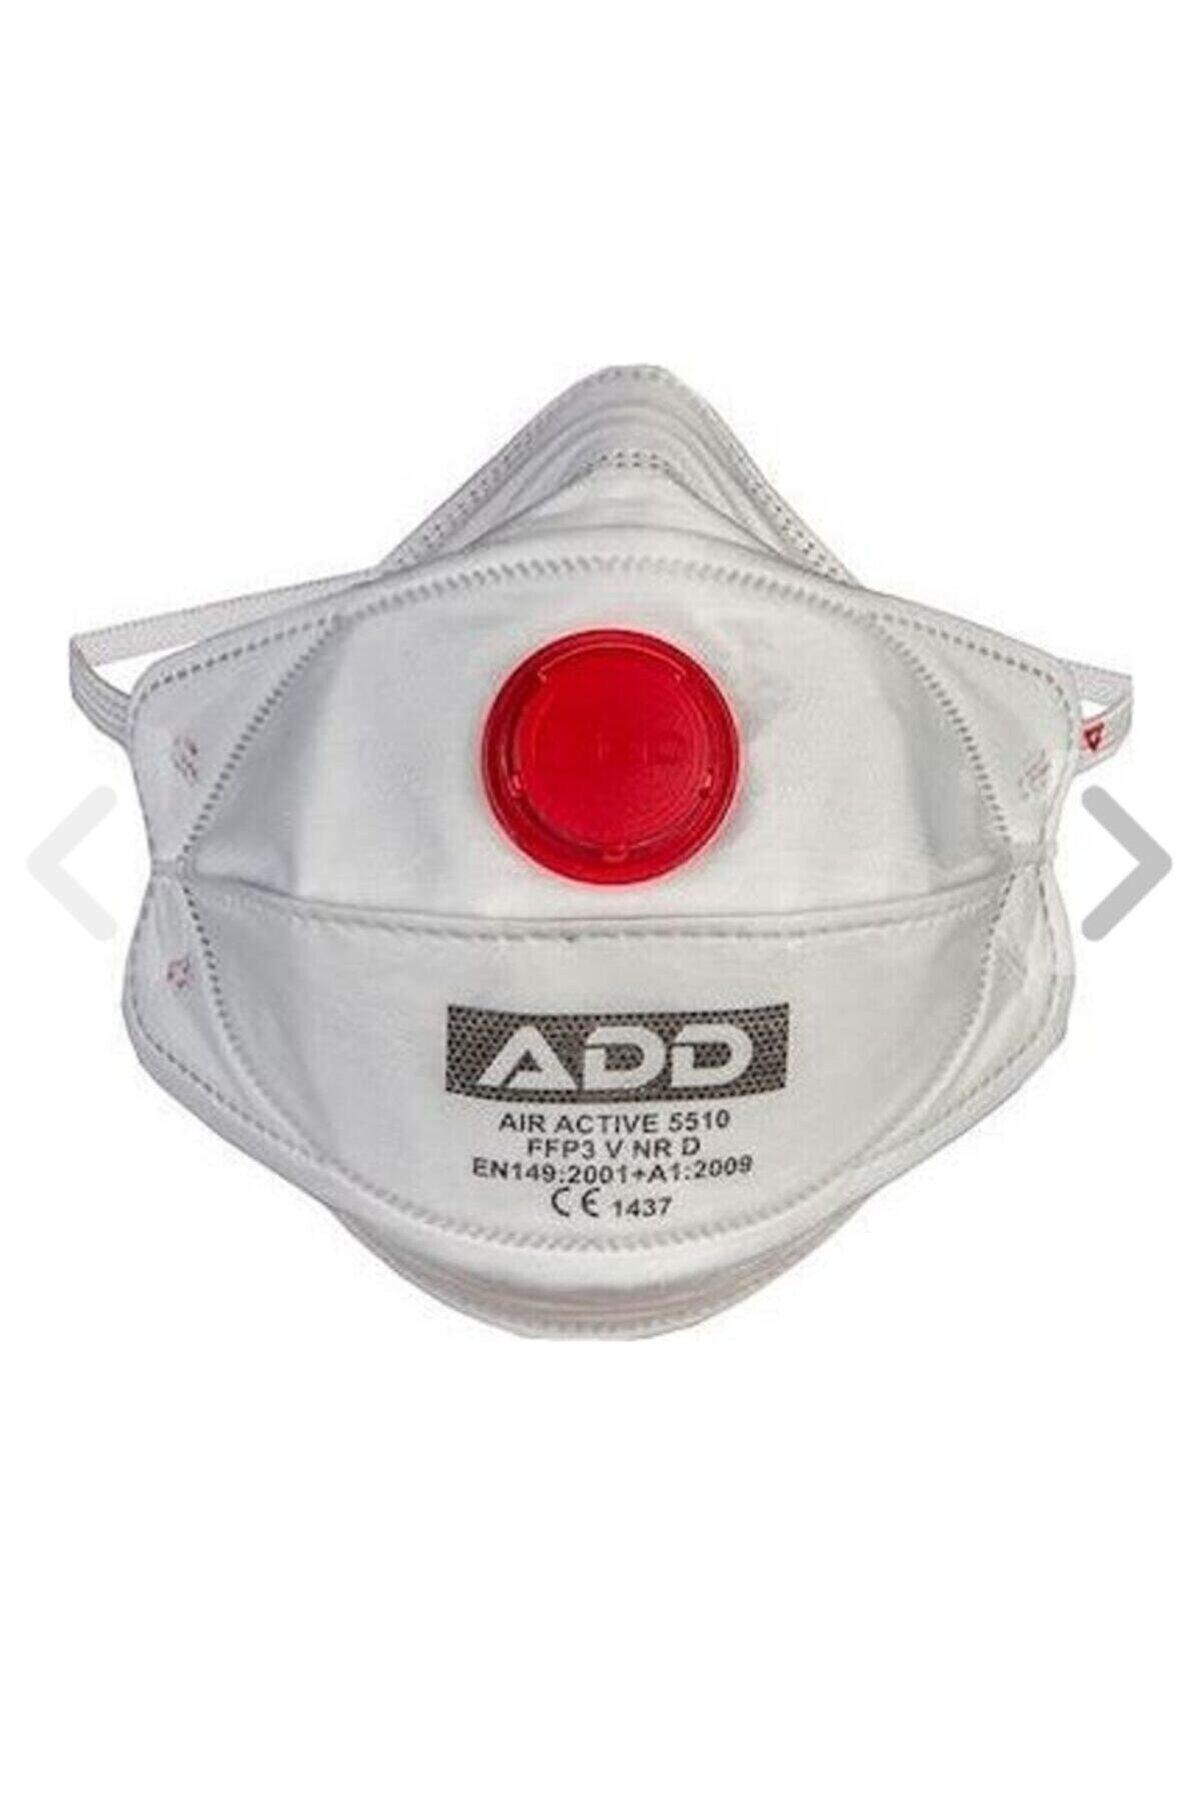 Add Air Active 5510 Ffp3 V Nr D Ventilli Maske